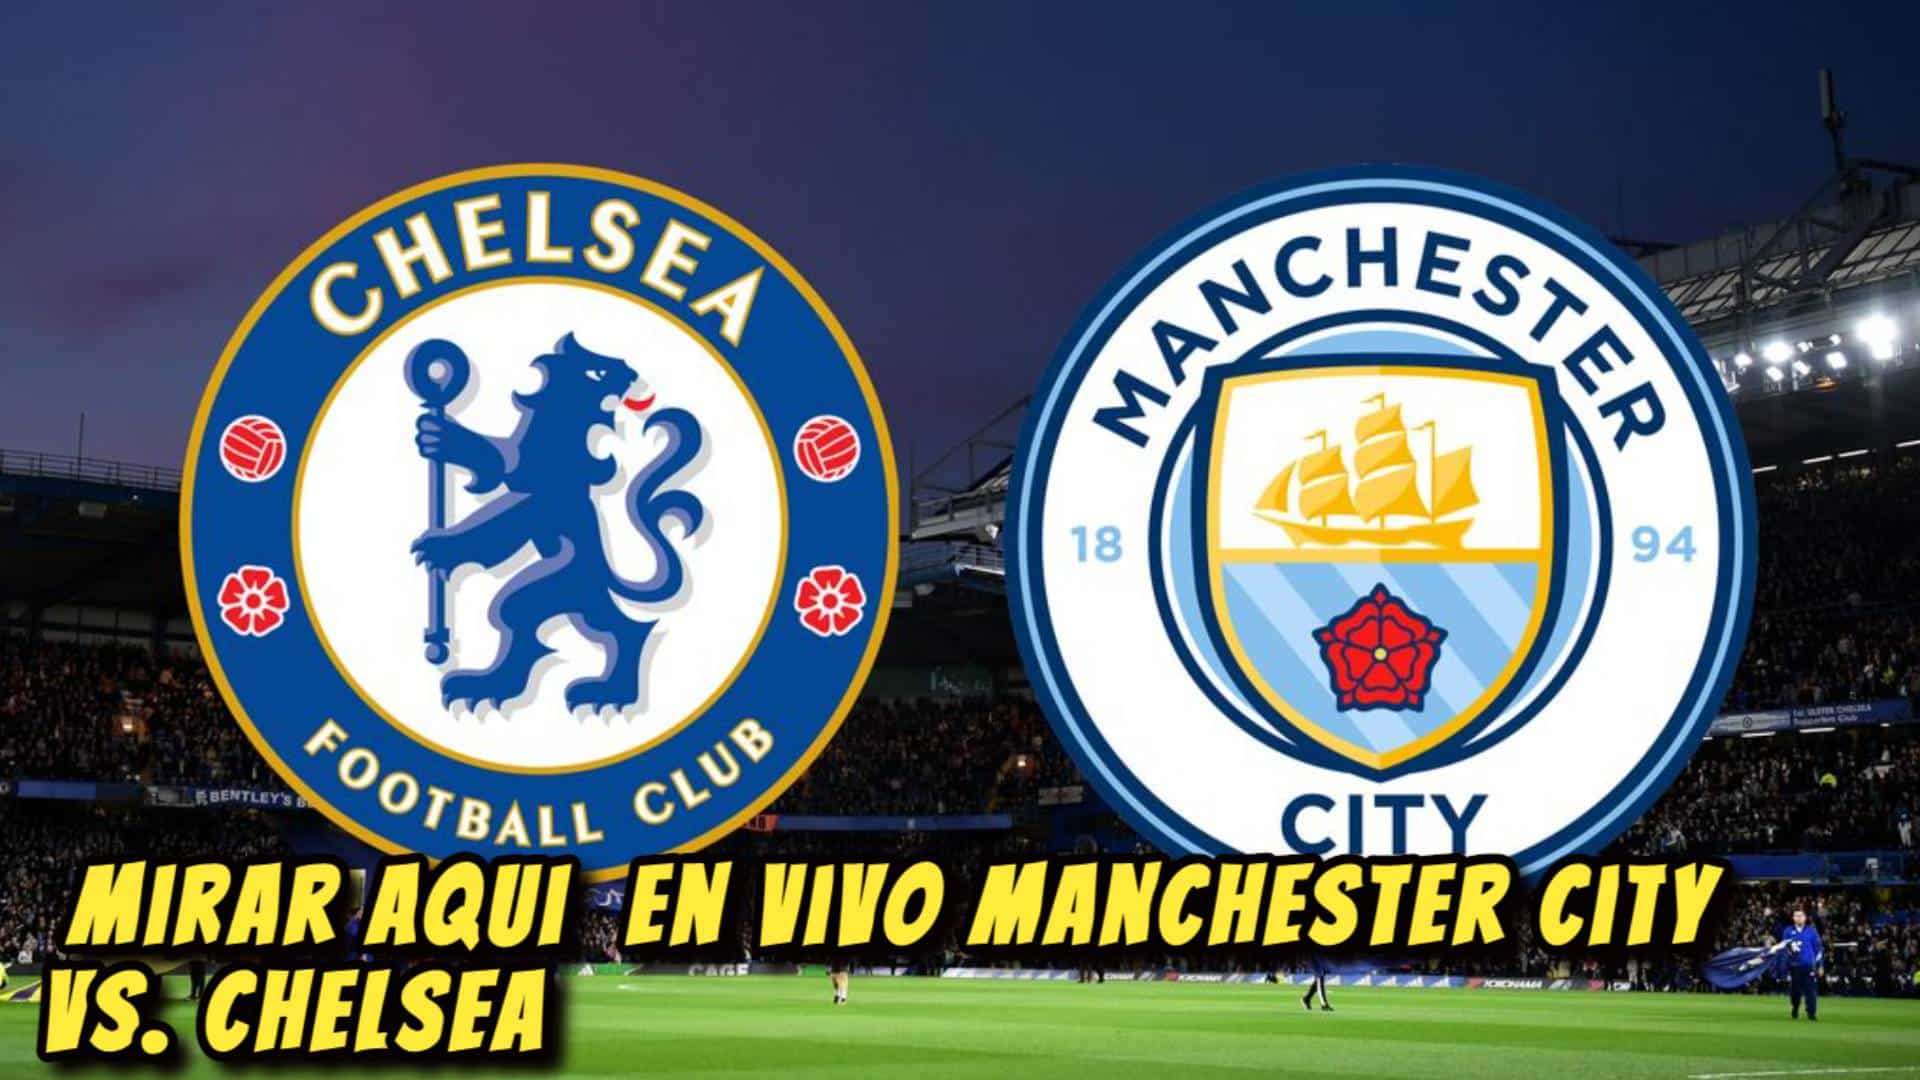 Mirar Aqui en vivo Manchester City vs. Chelsea